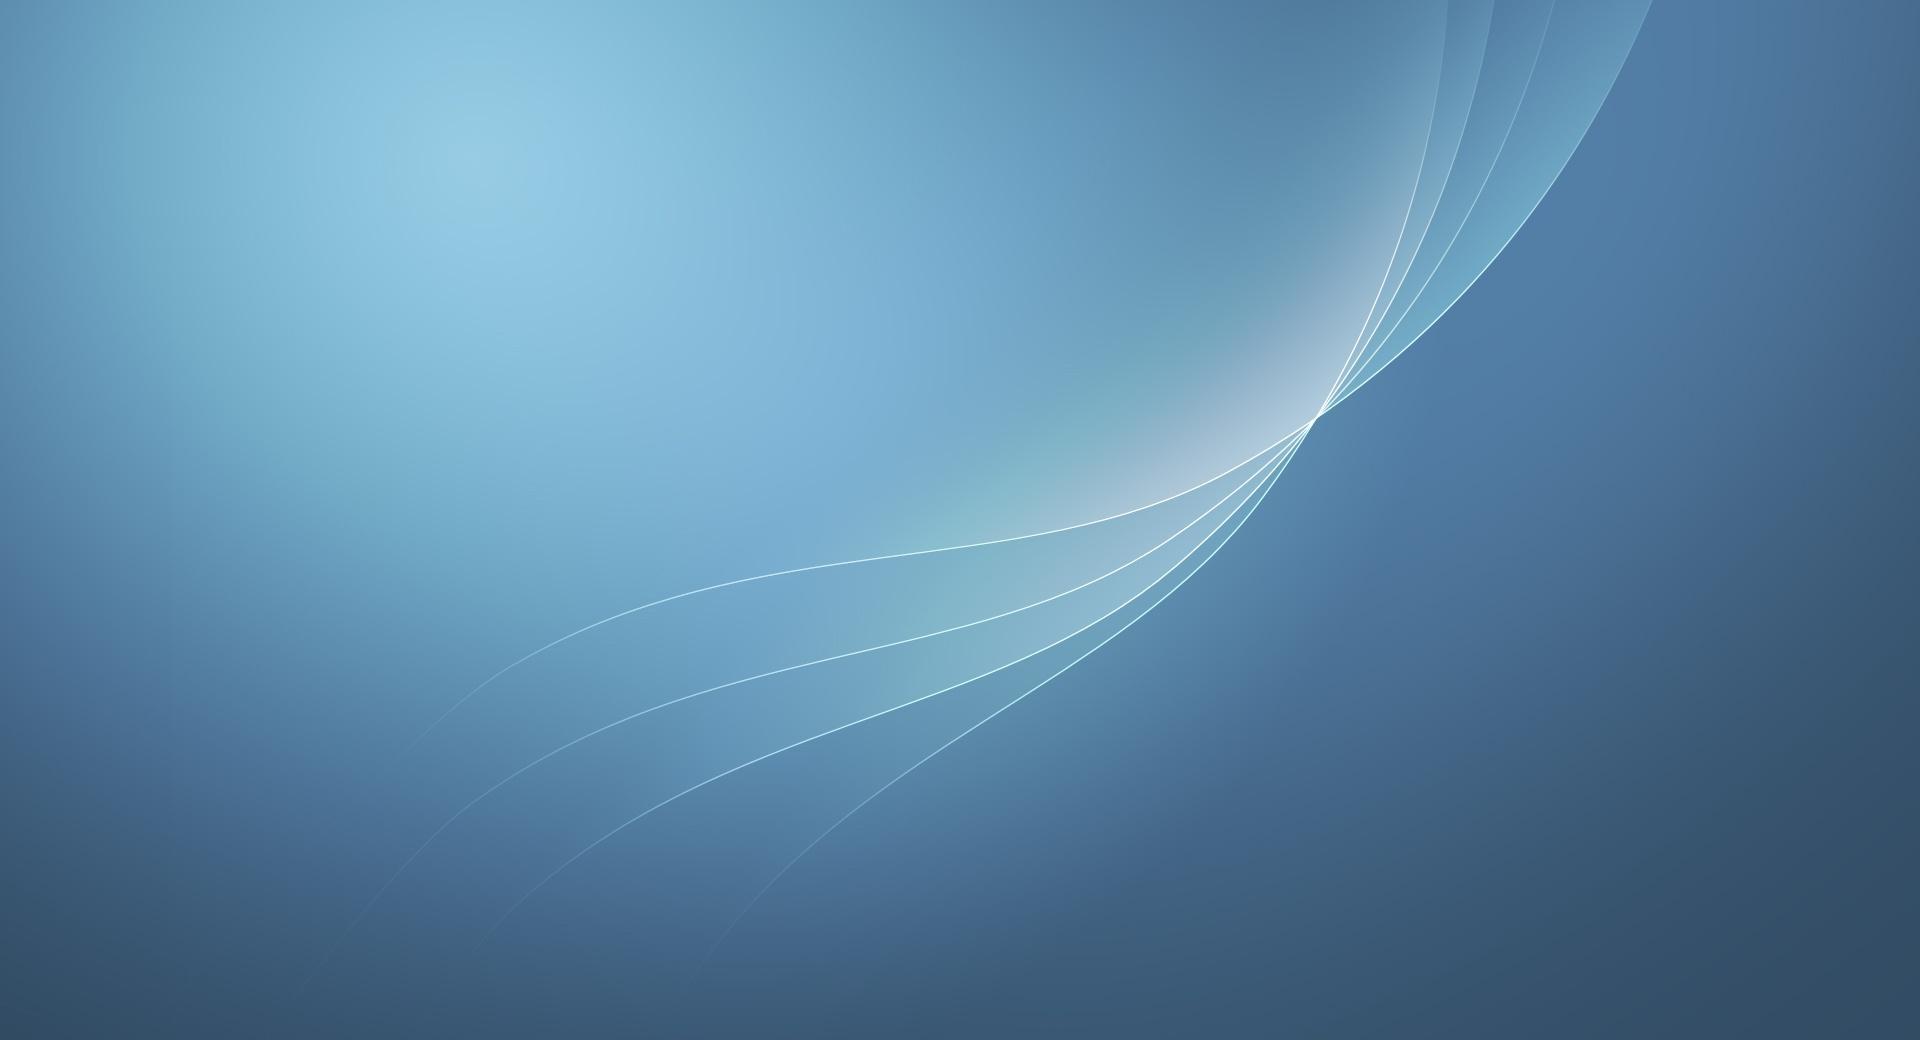 Minimalist Blue wallpapers HD quality